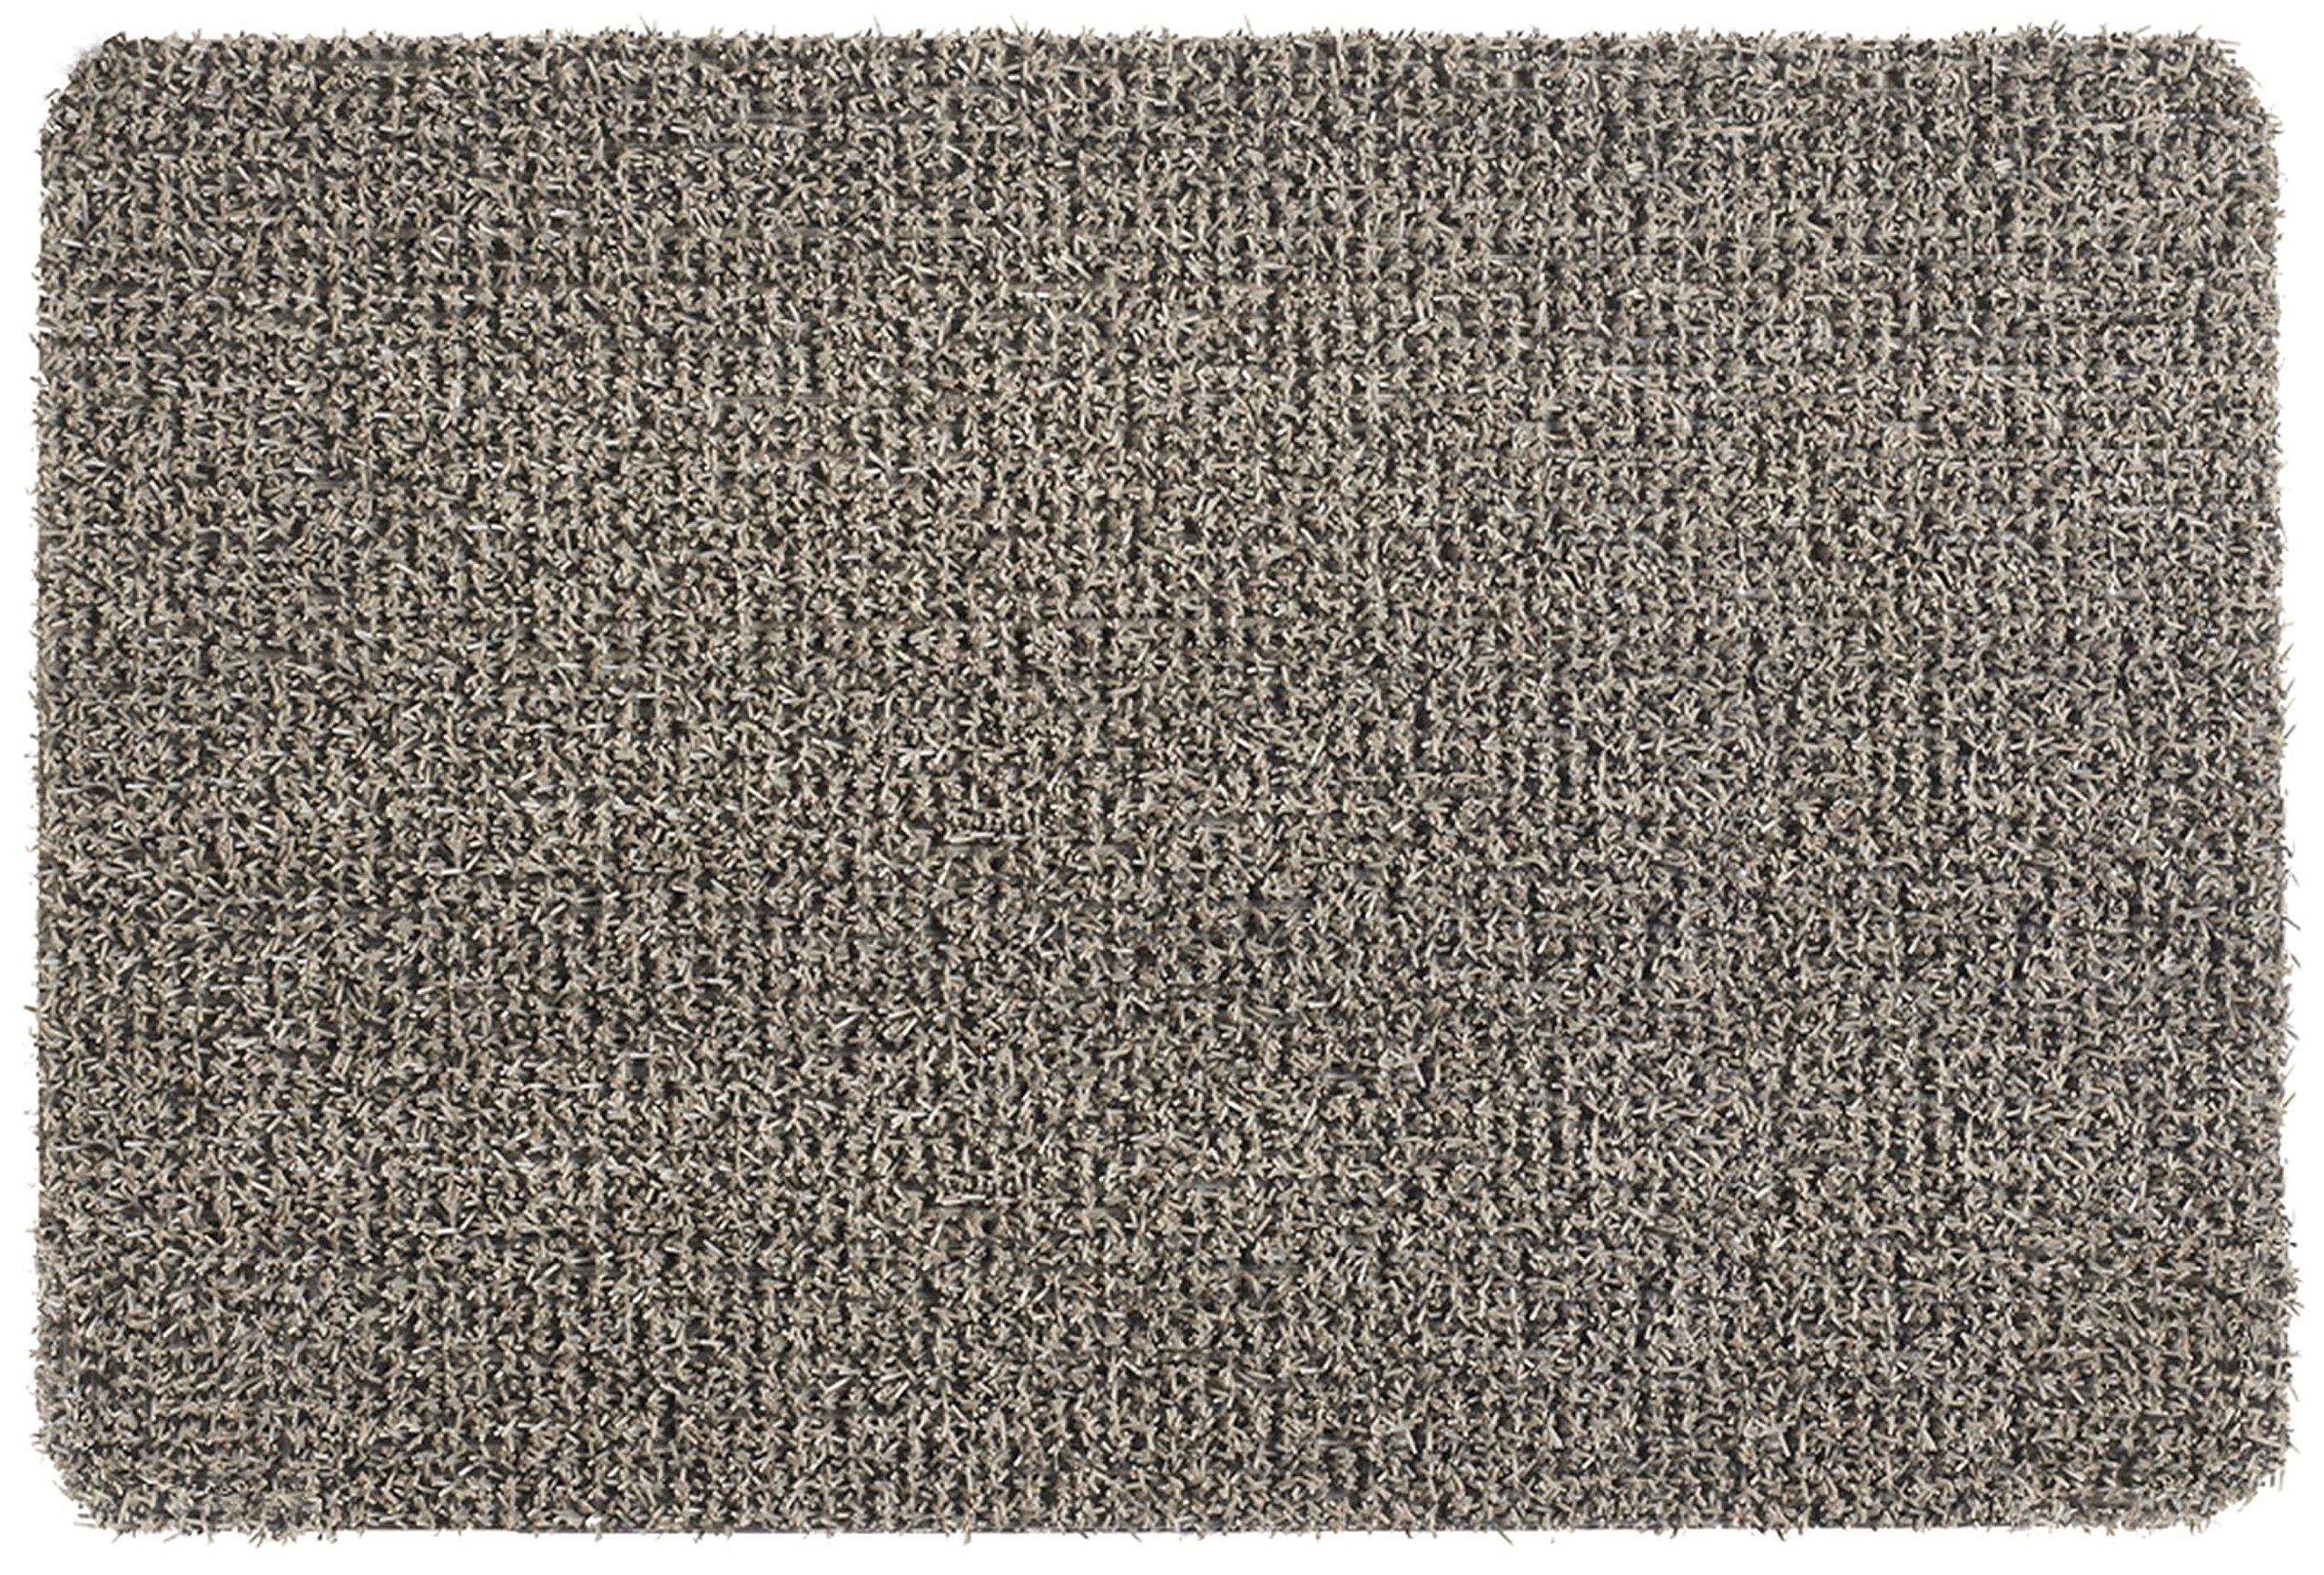 Grassworx Clean Machine Flair Doormat, 24'' x 36'', Earth Taupe (10372034)